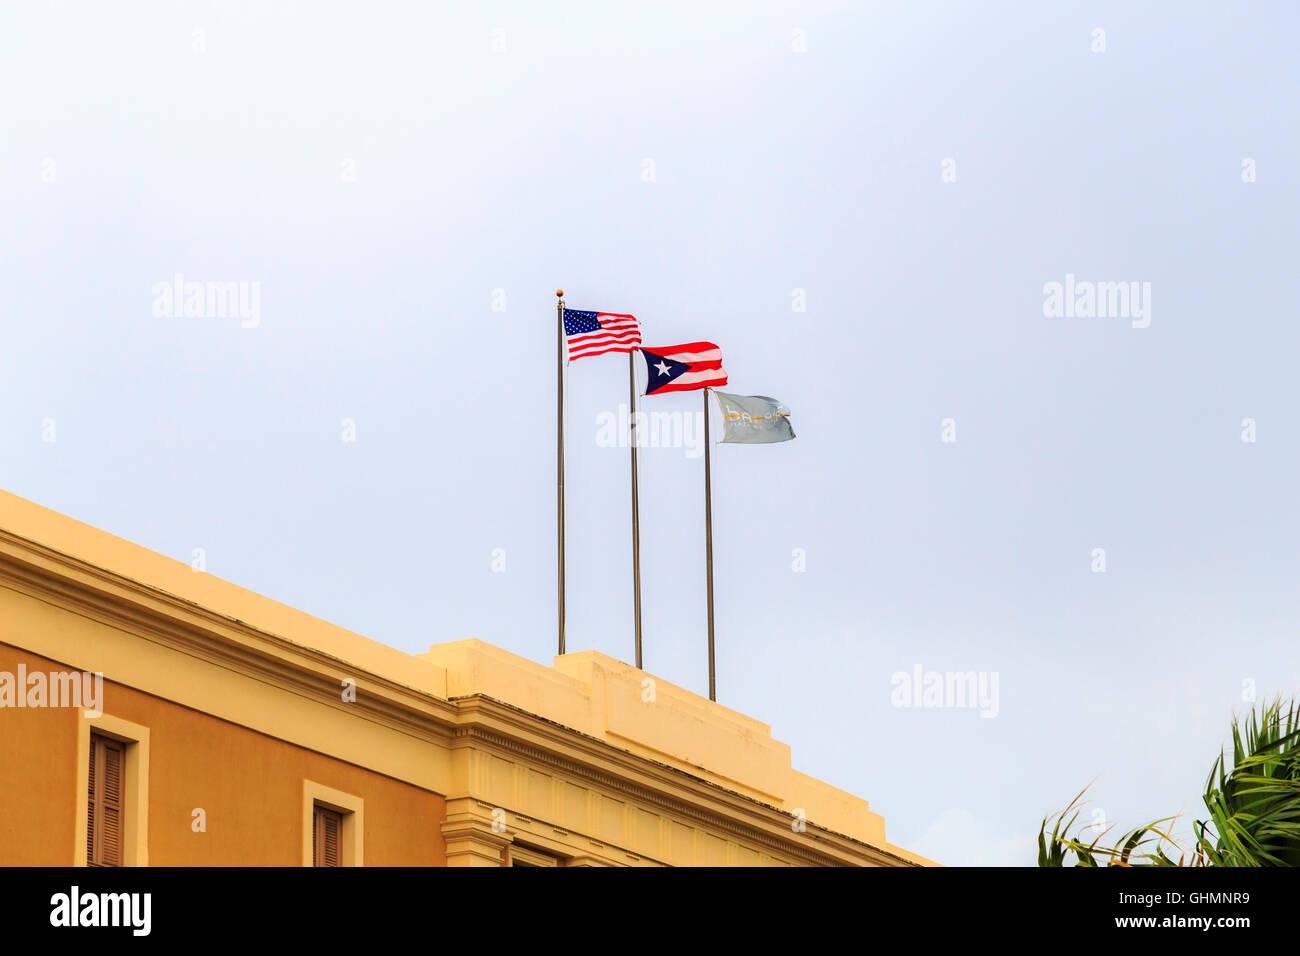 U.S. Flag with Puerto Rico Flag and Ballaja - Stock Image